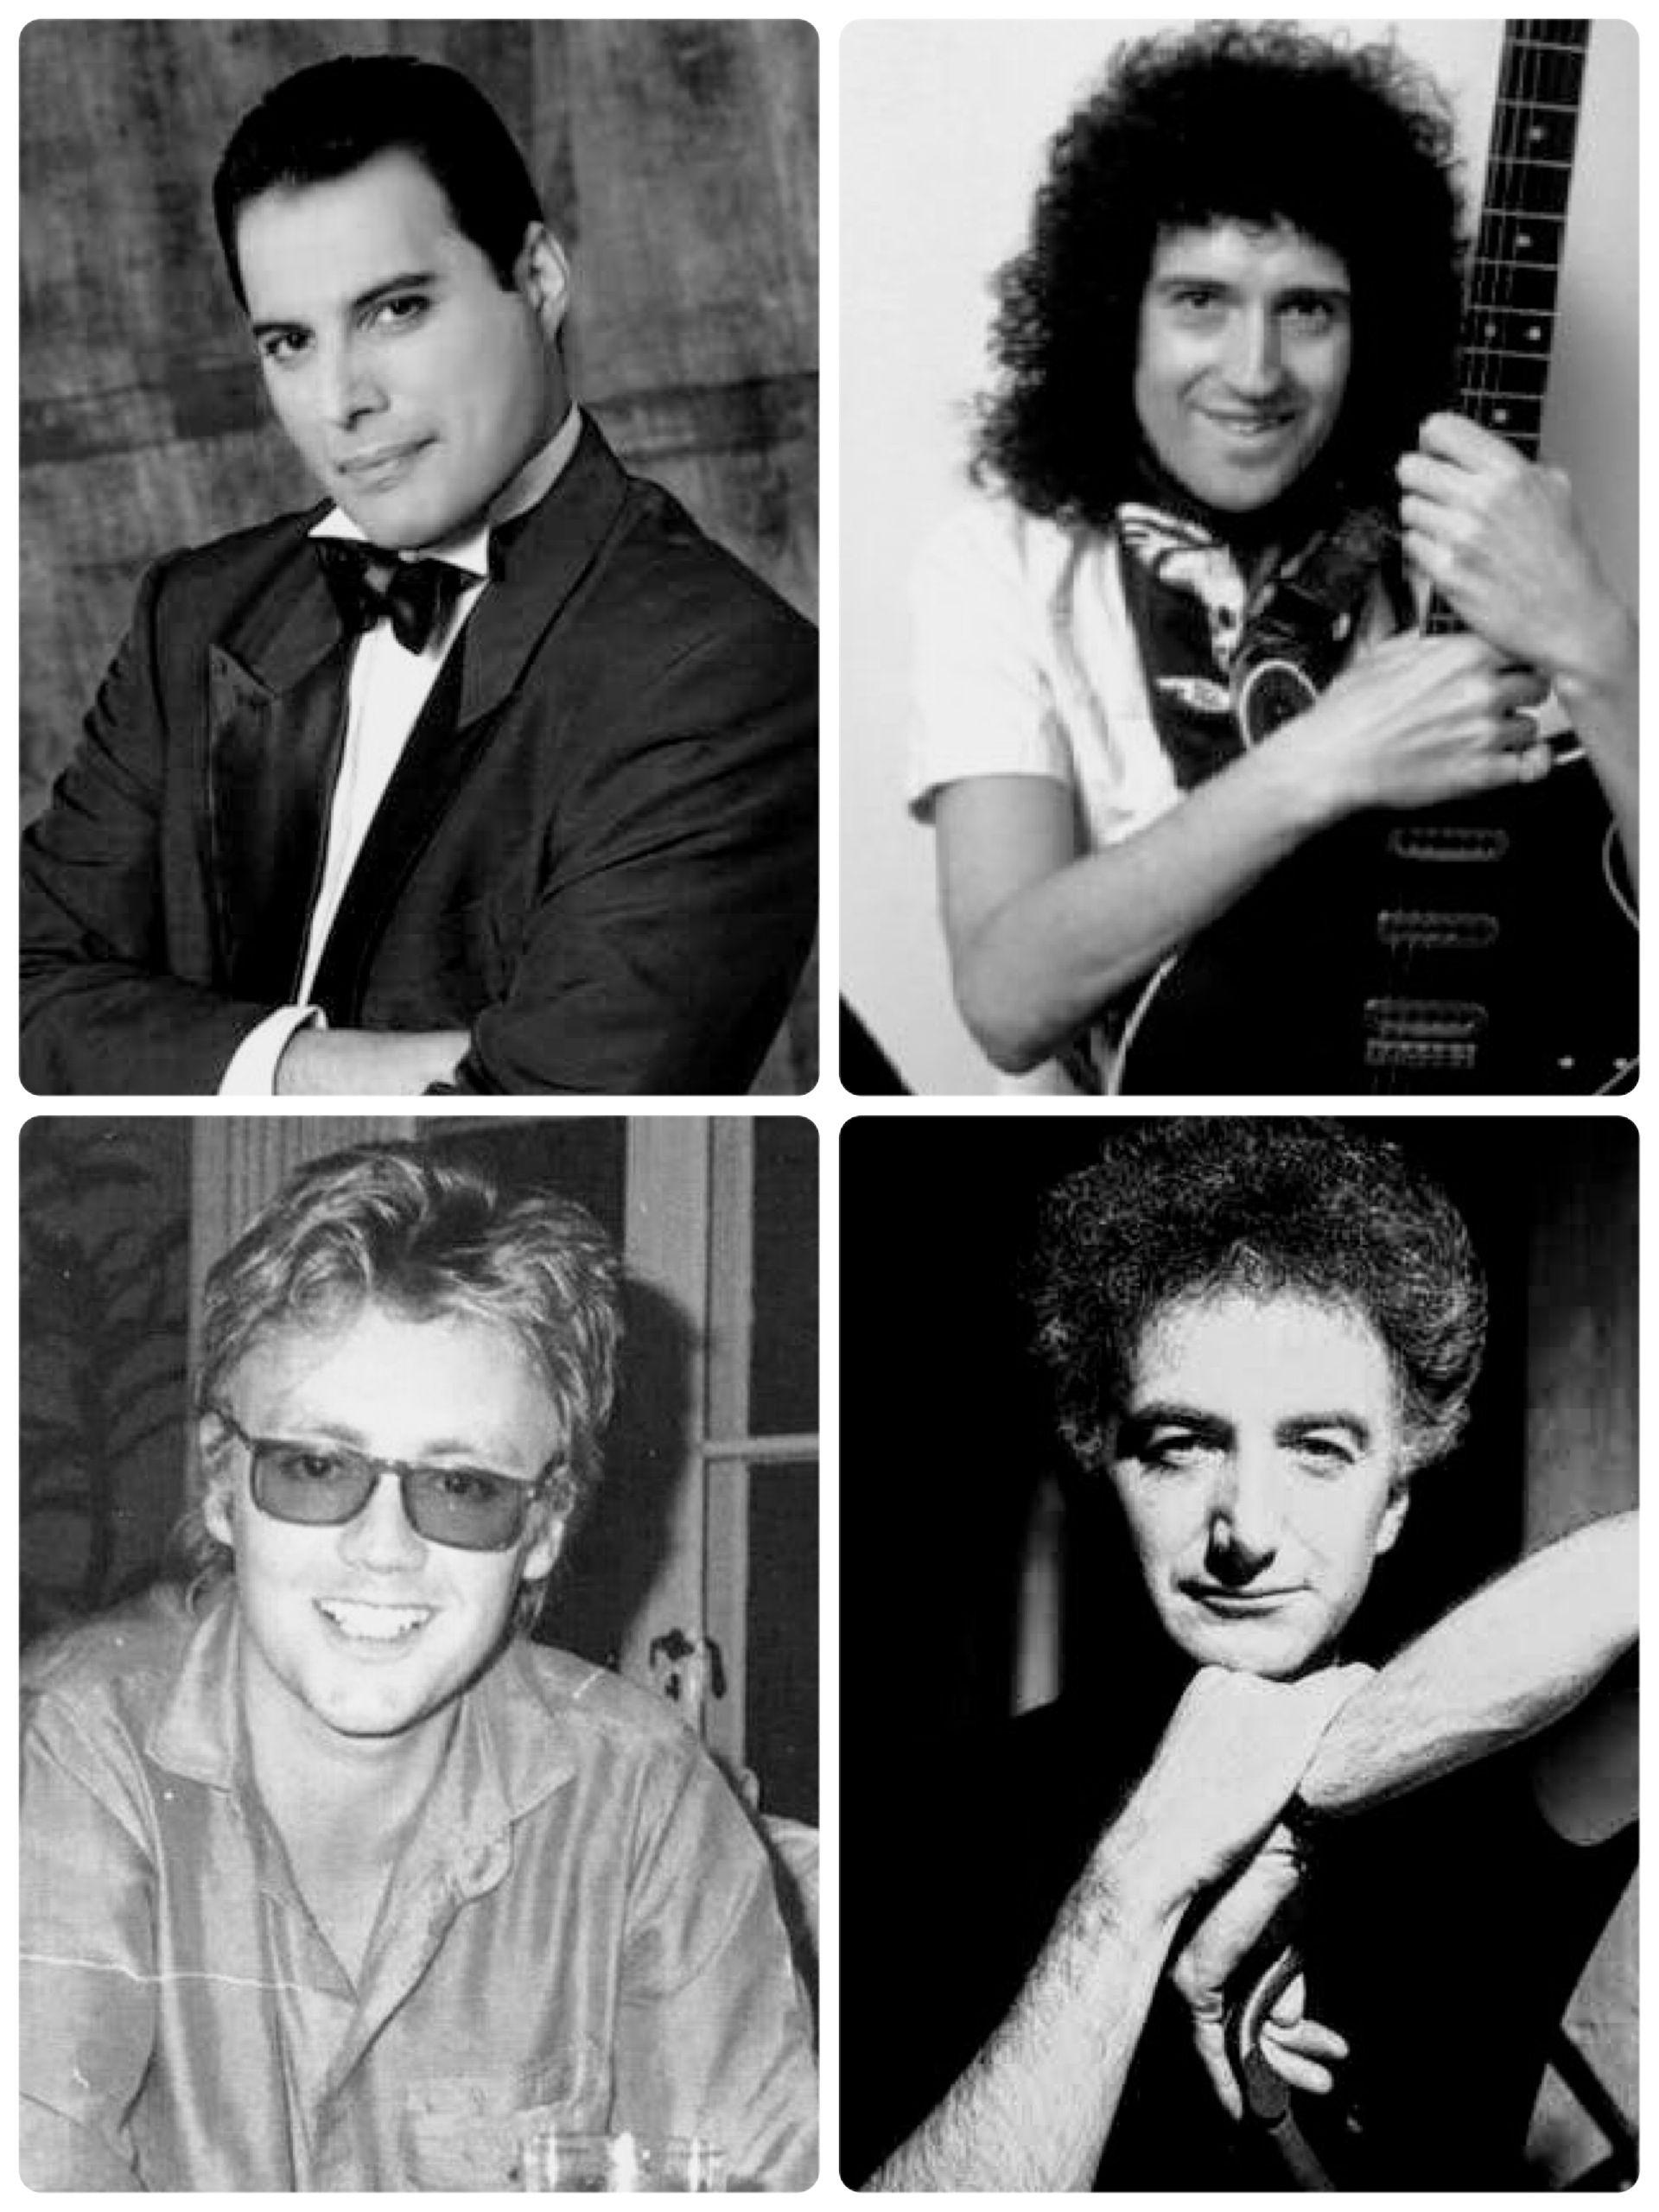 Pin by Linda Darlene on Freddie Mercury and Others in 2019